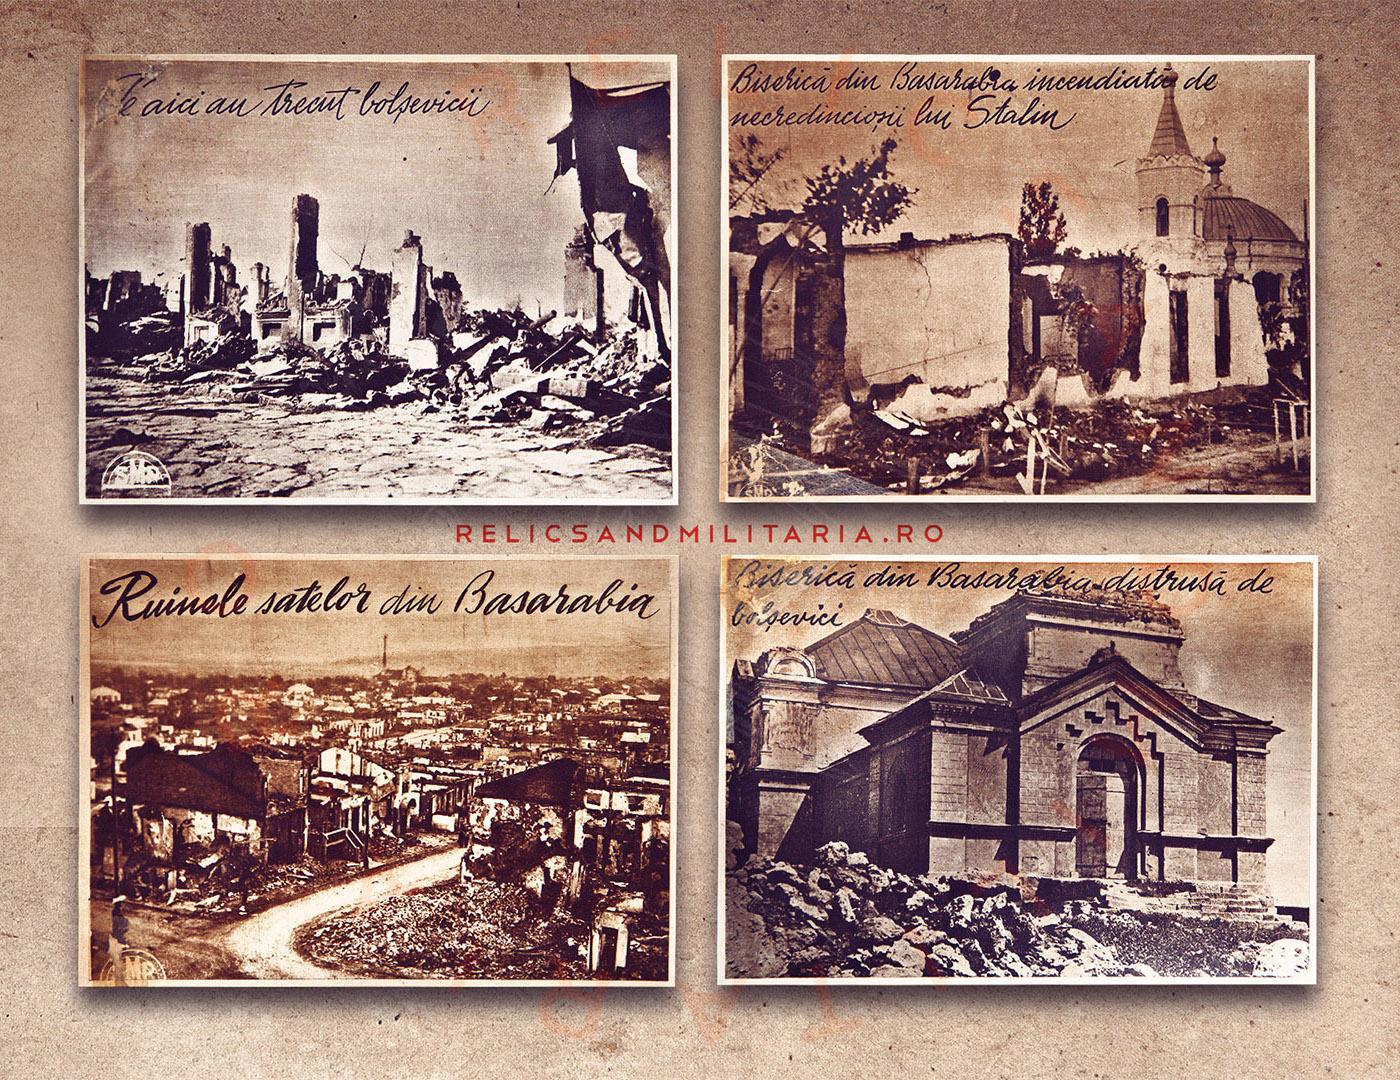 Ruinele cladirilor din Basarabia distruse de bolsevici in al doilea razboi mondial